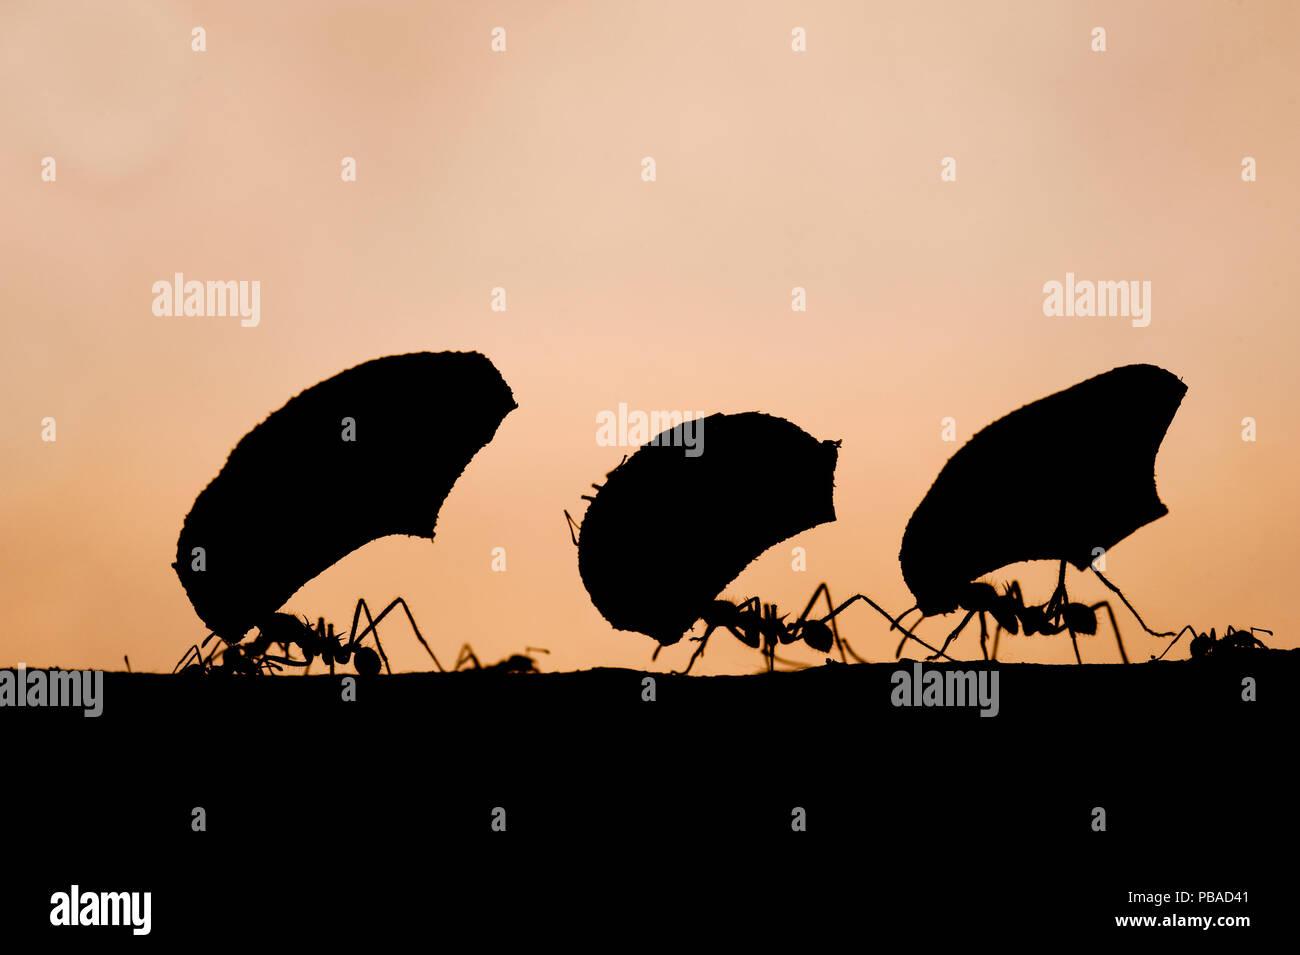 Leaf cutter ants (Atta sp) silhouetted carrying plant matter, Laguna del Lagarto, Santa Rita, Costa Rica - Stock Image